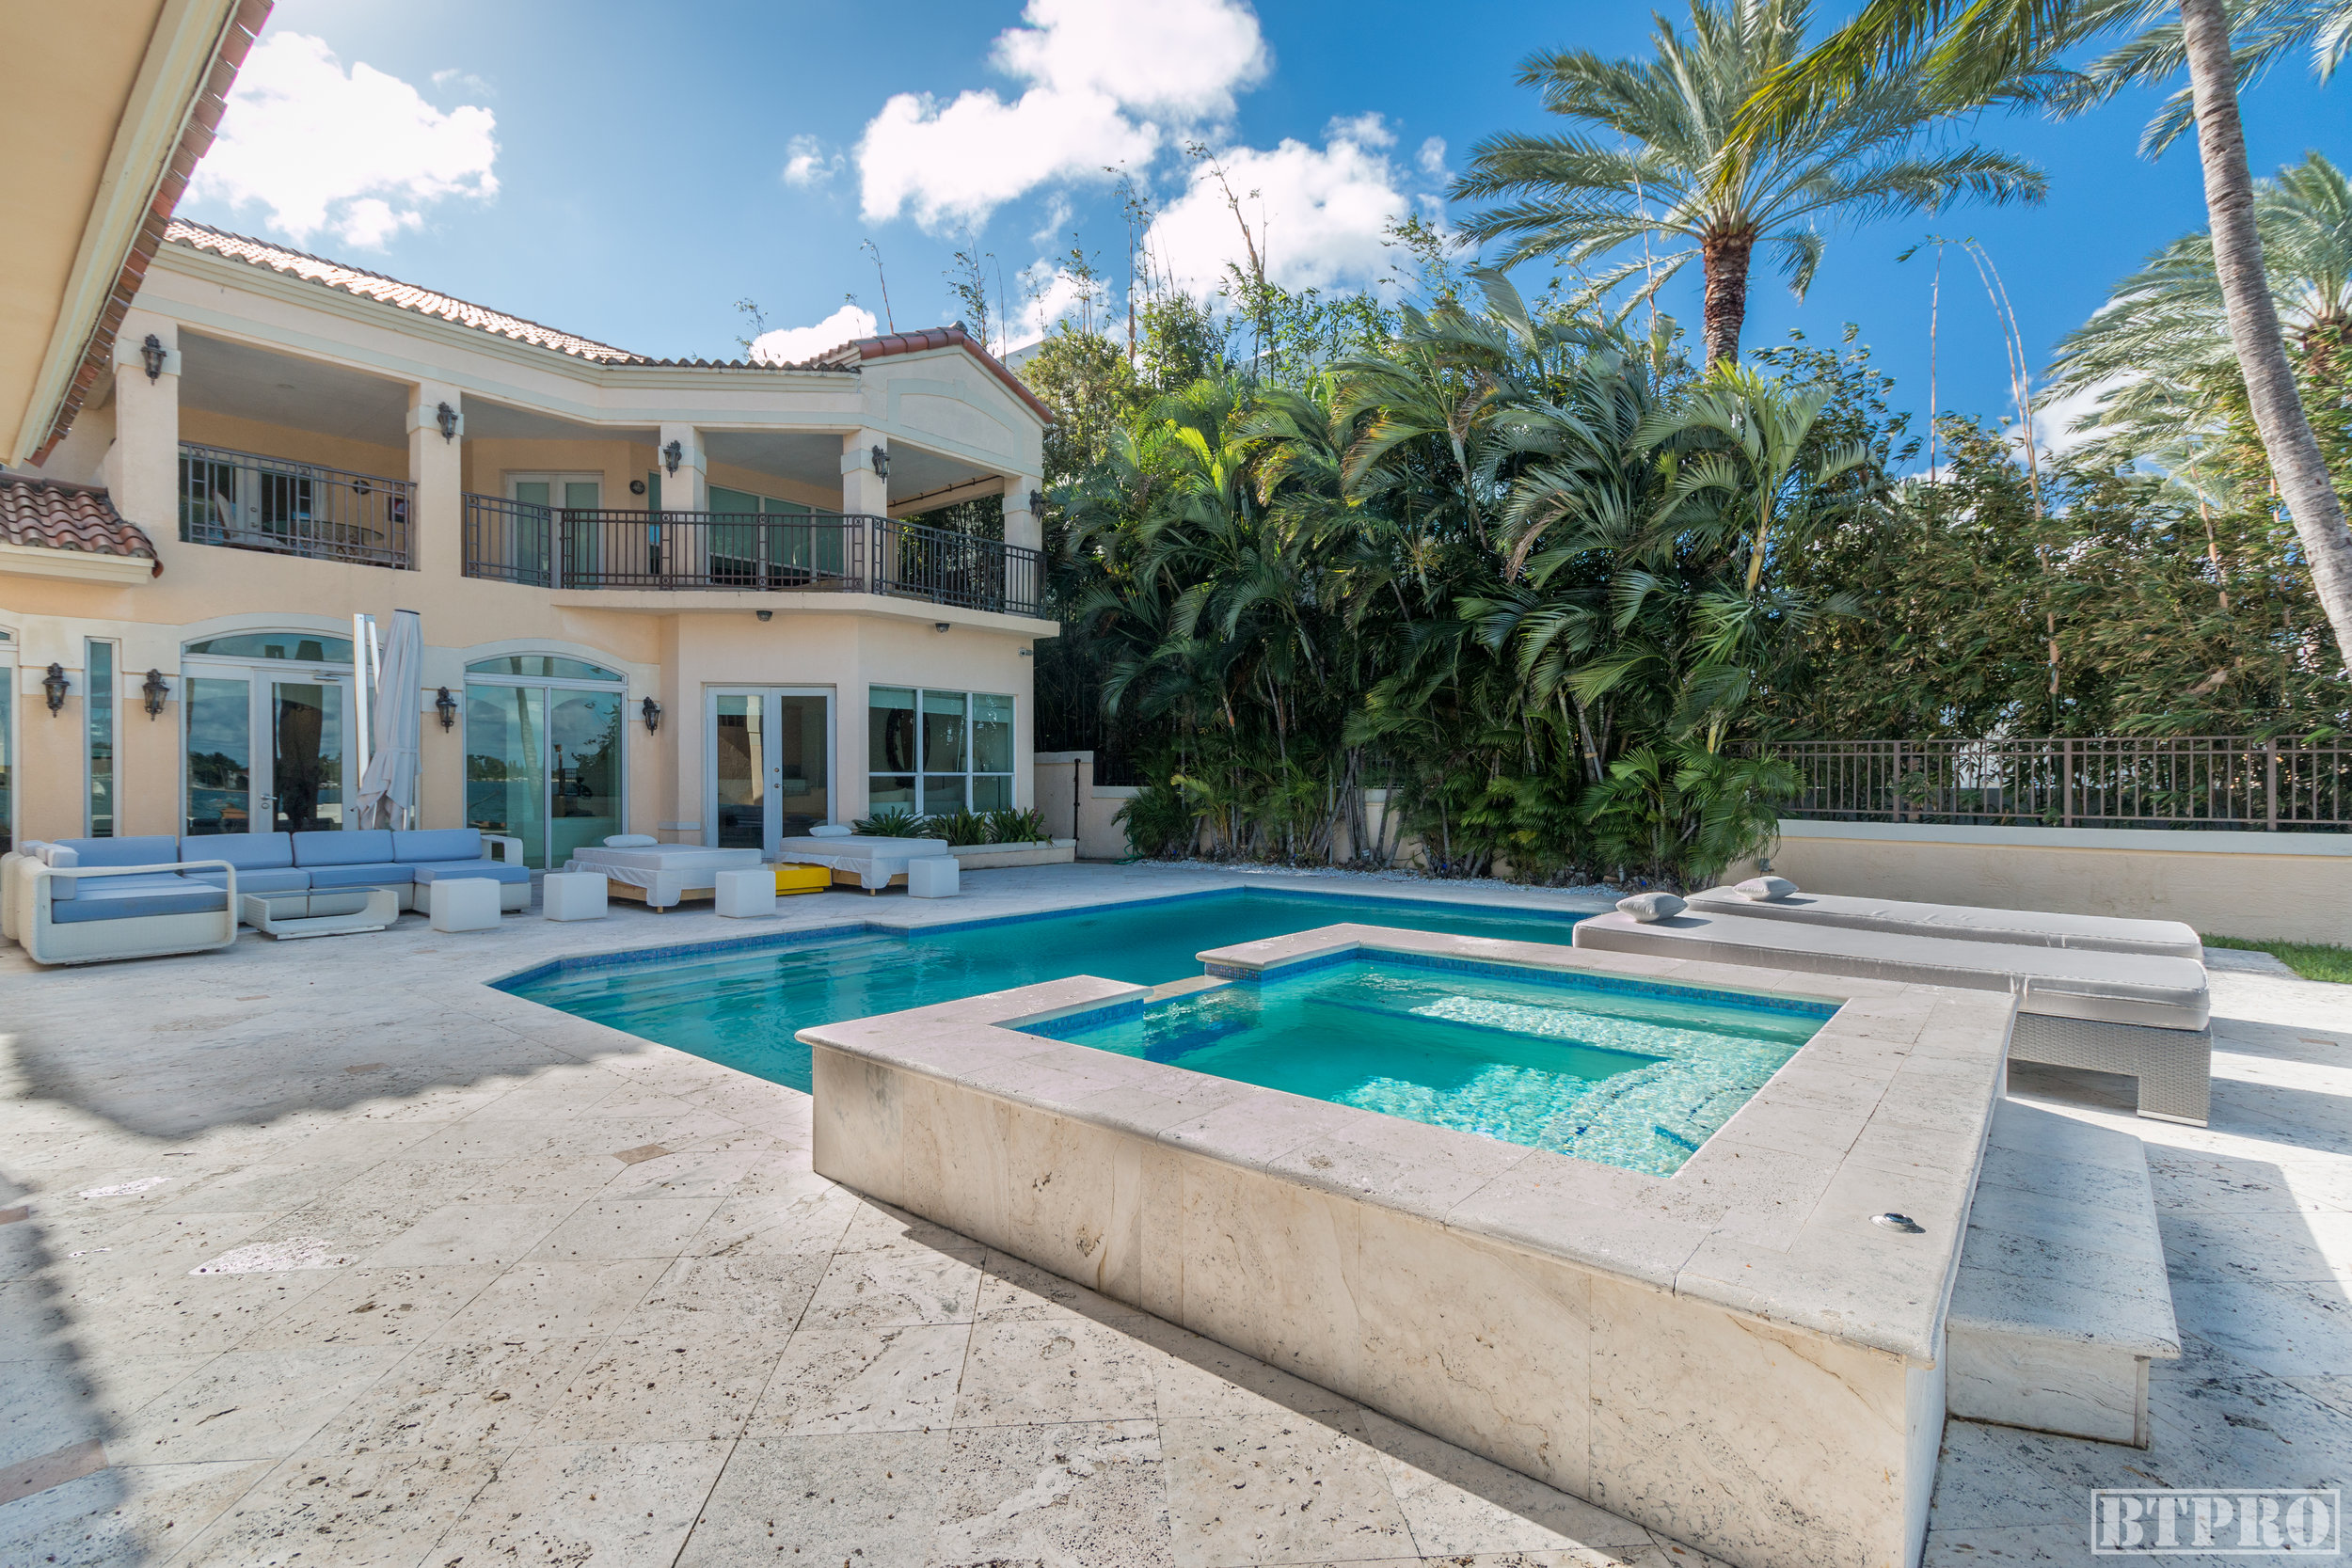 villa, south beach, hibiscus island, miami, miami real estate, south beach real estate, realtor, miami realtor, realty, miami realty,luxury, luxury living, luxury rentals